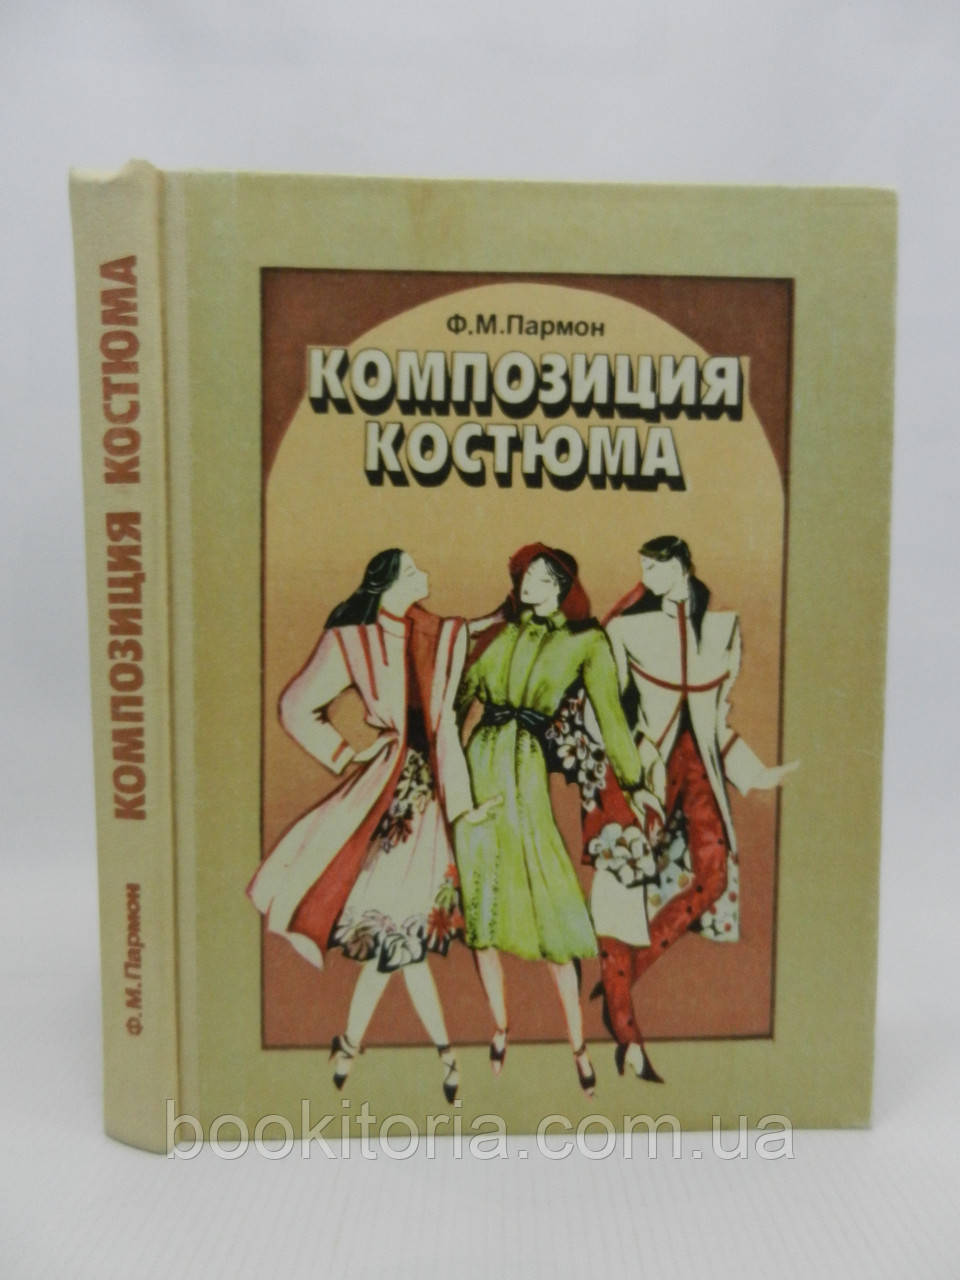 Пармон Ф.М. Композиция костюма (б/у).